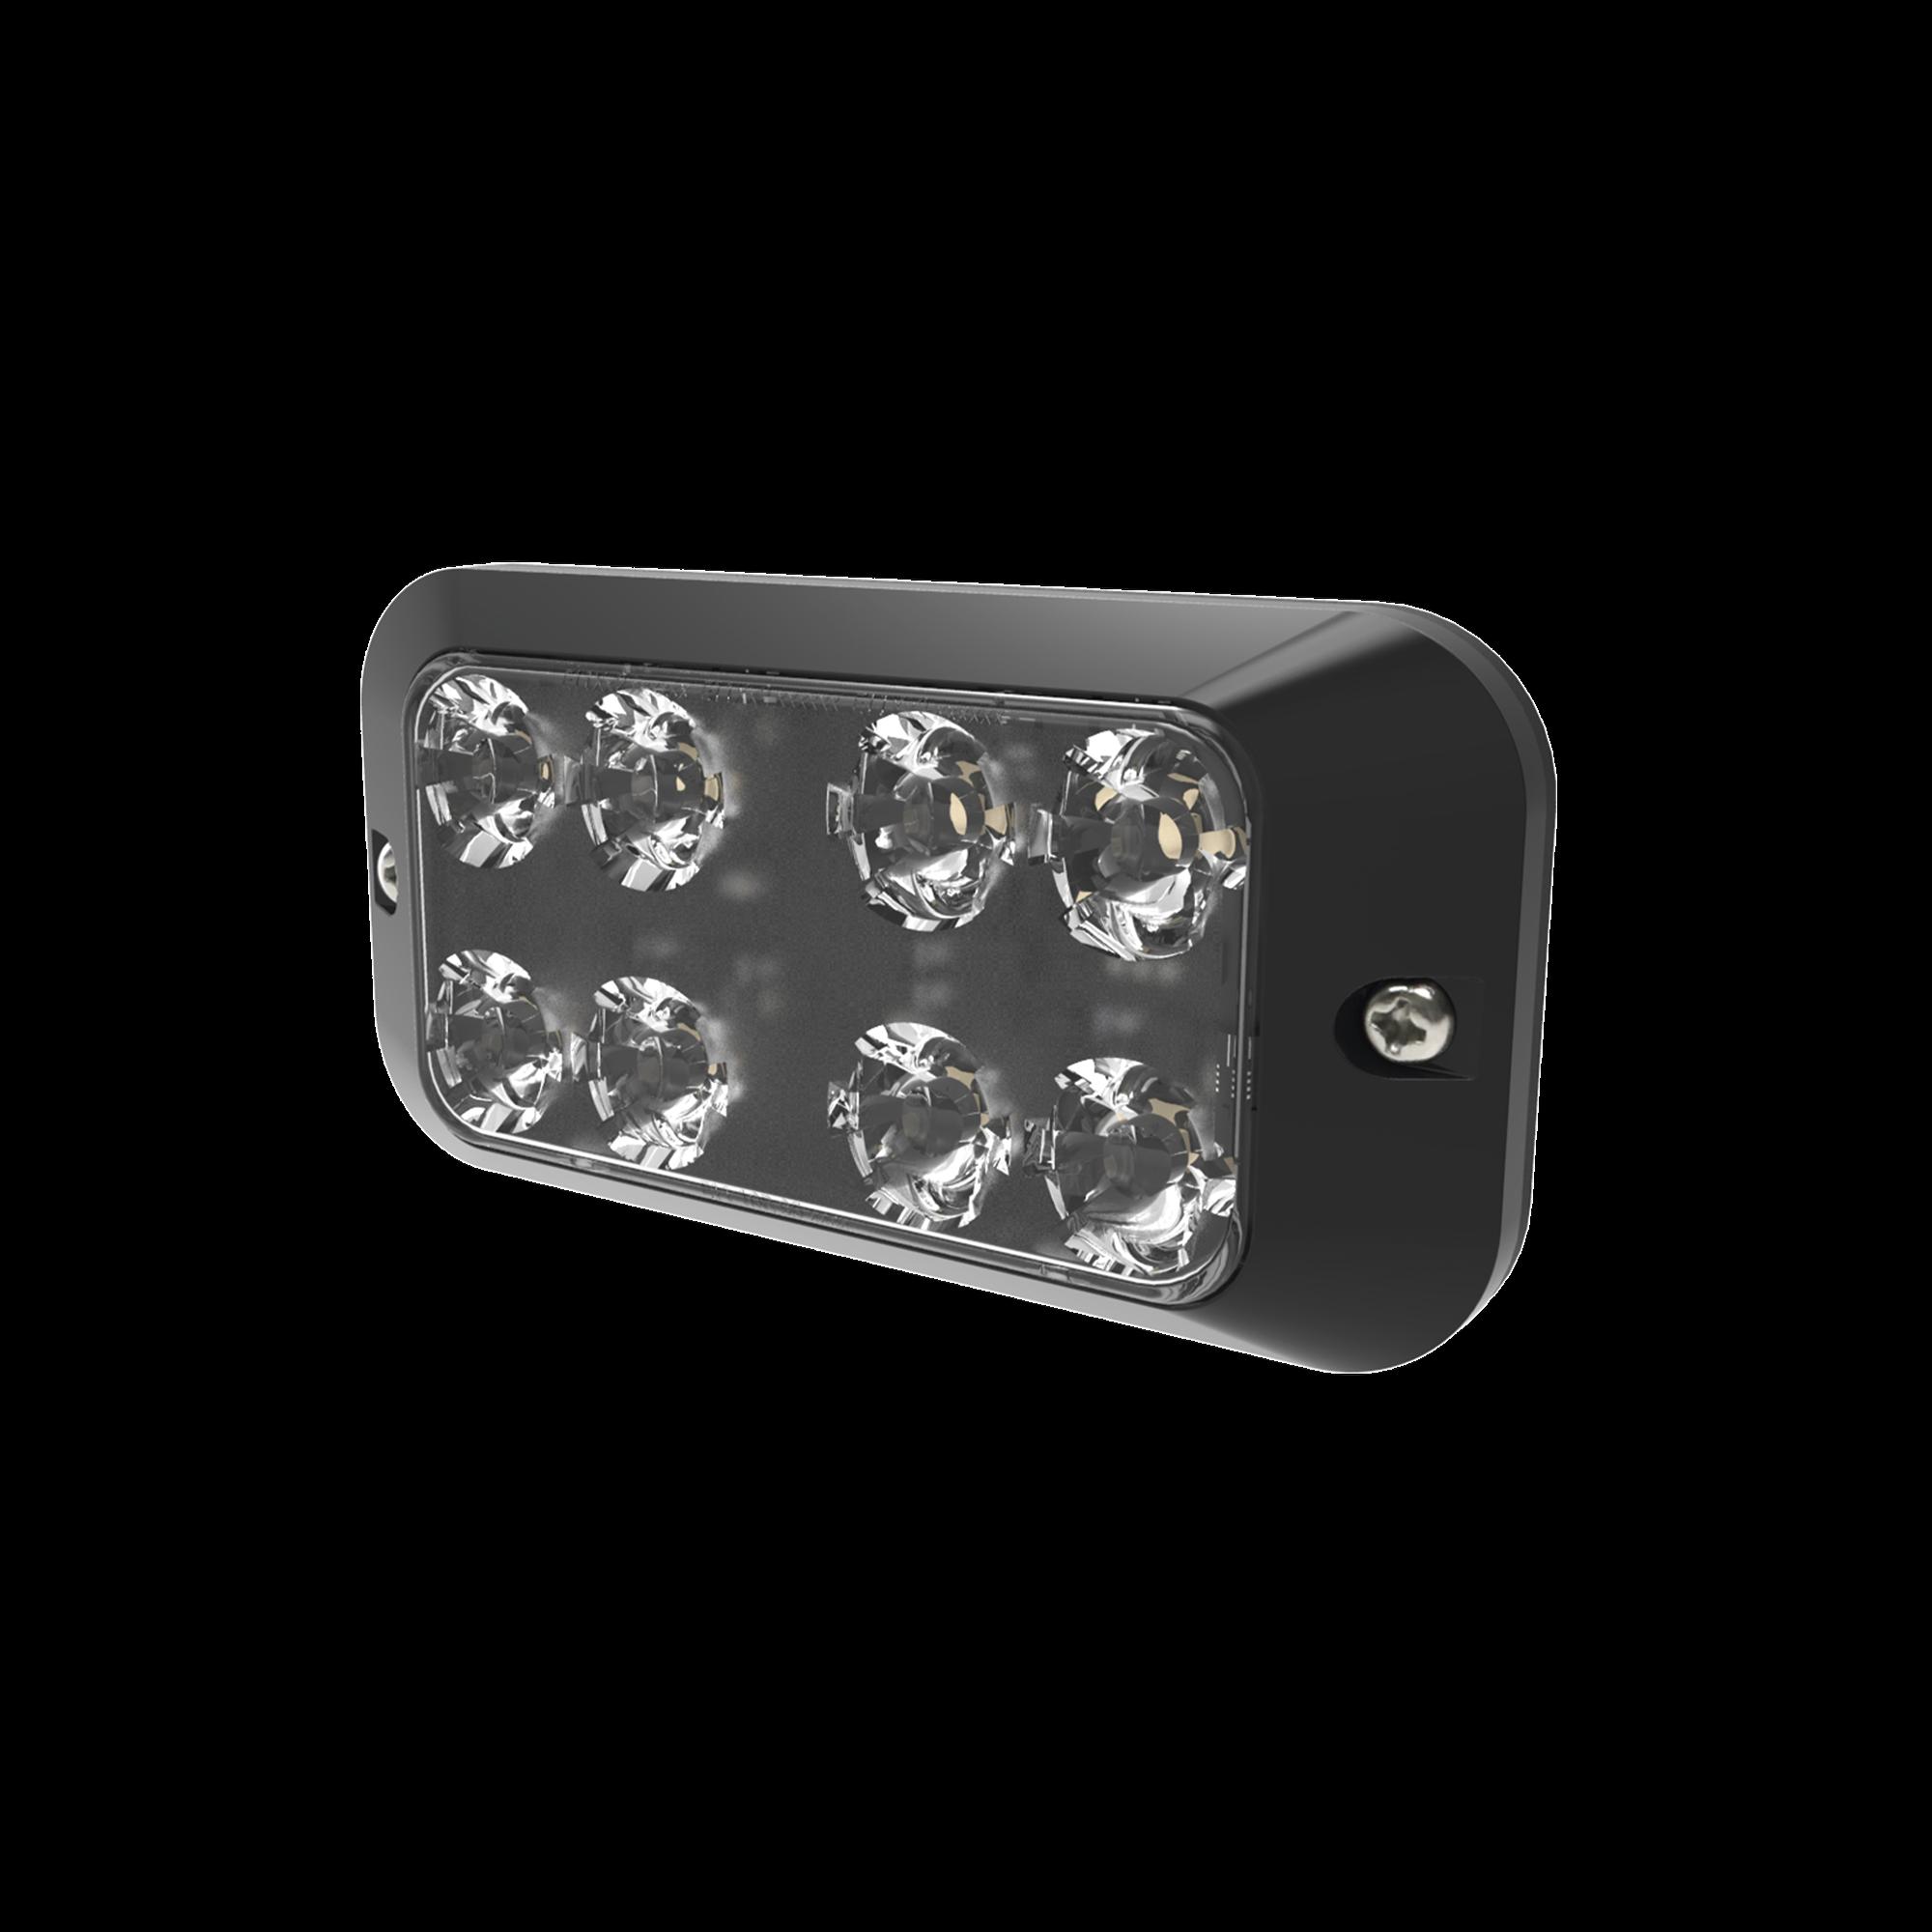 Luz auxiliar con 8 LEDs color rojo-claro